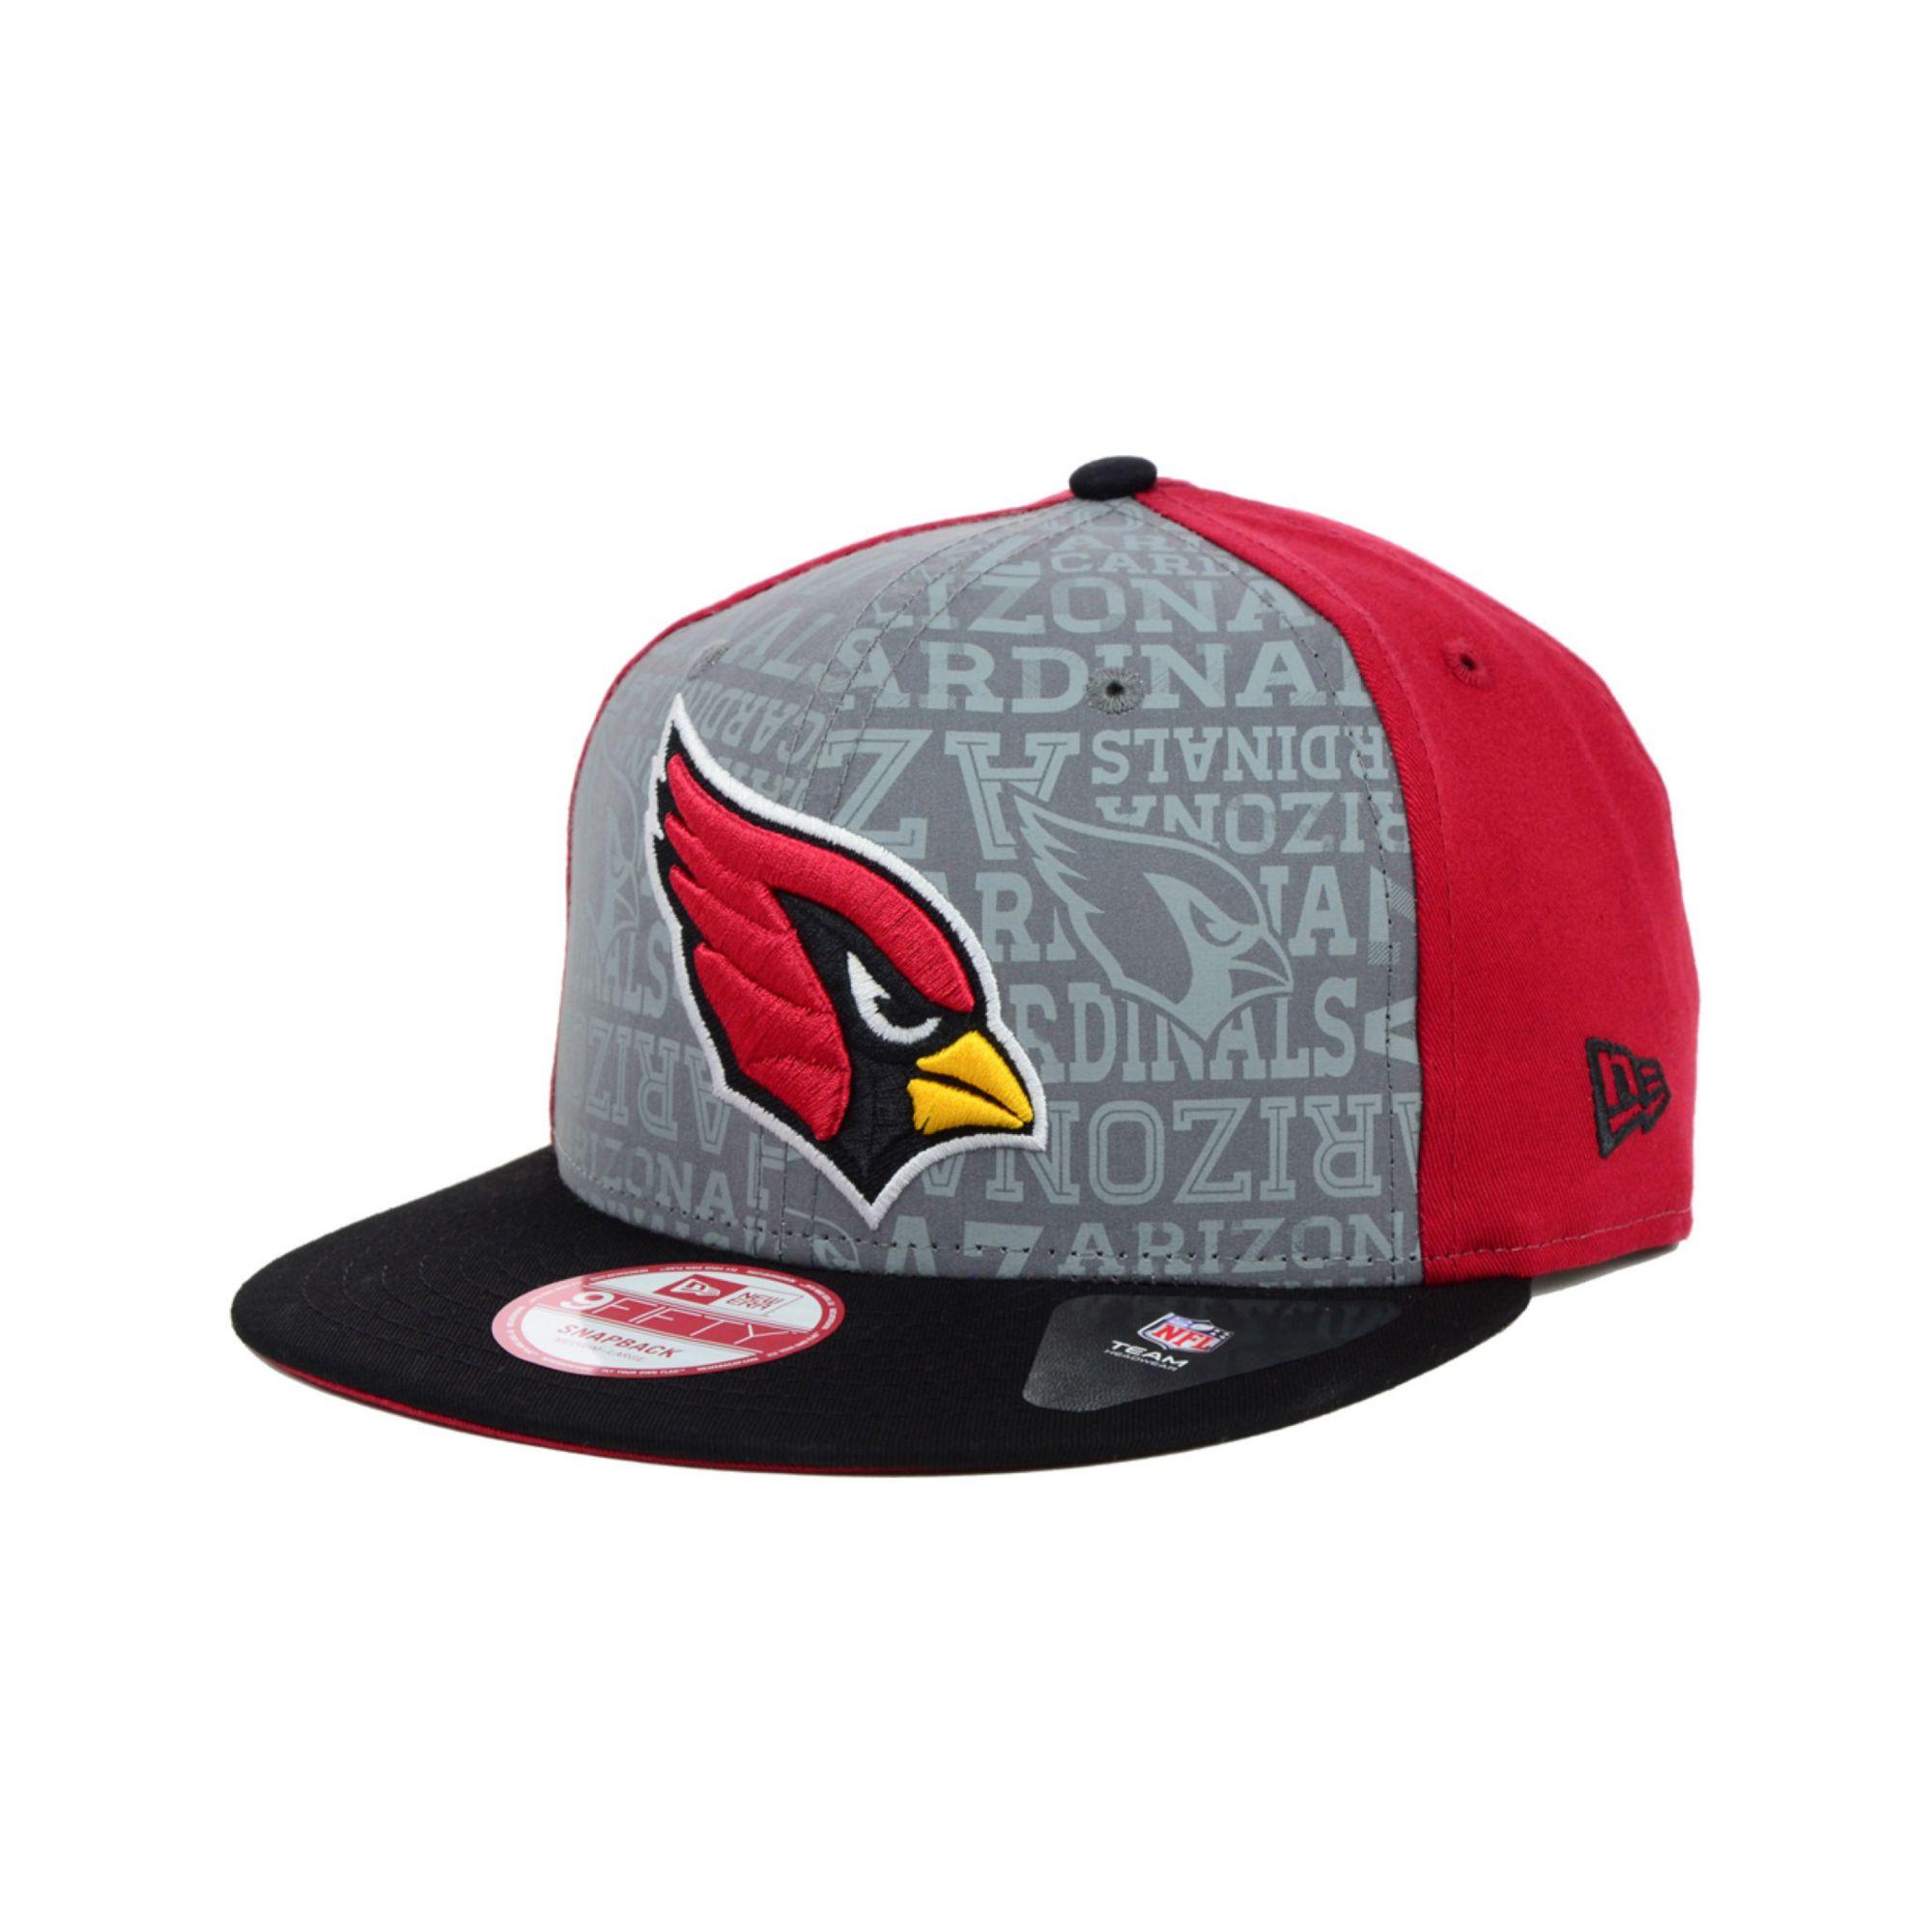 3baa6c30f2b ... czech lyst ktz kids arizona cardinals nfl draft 9fifty snapback cap in  1ecf7 77c70